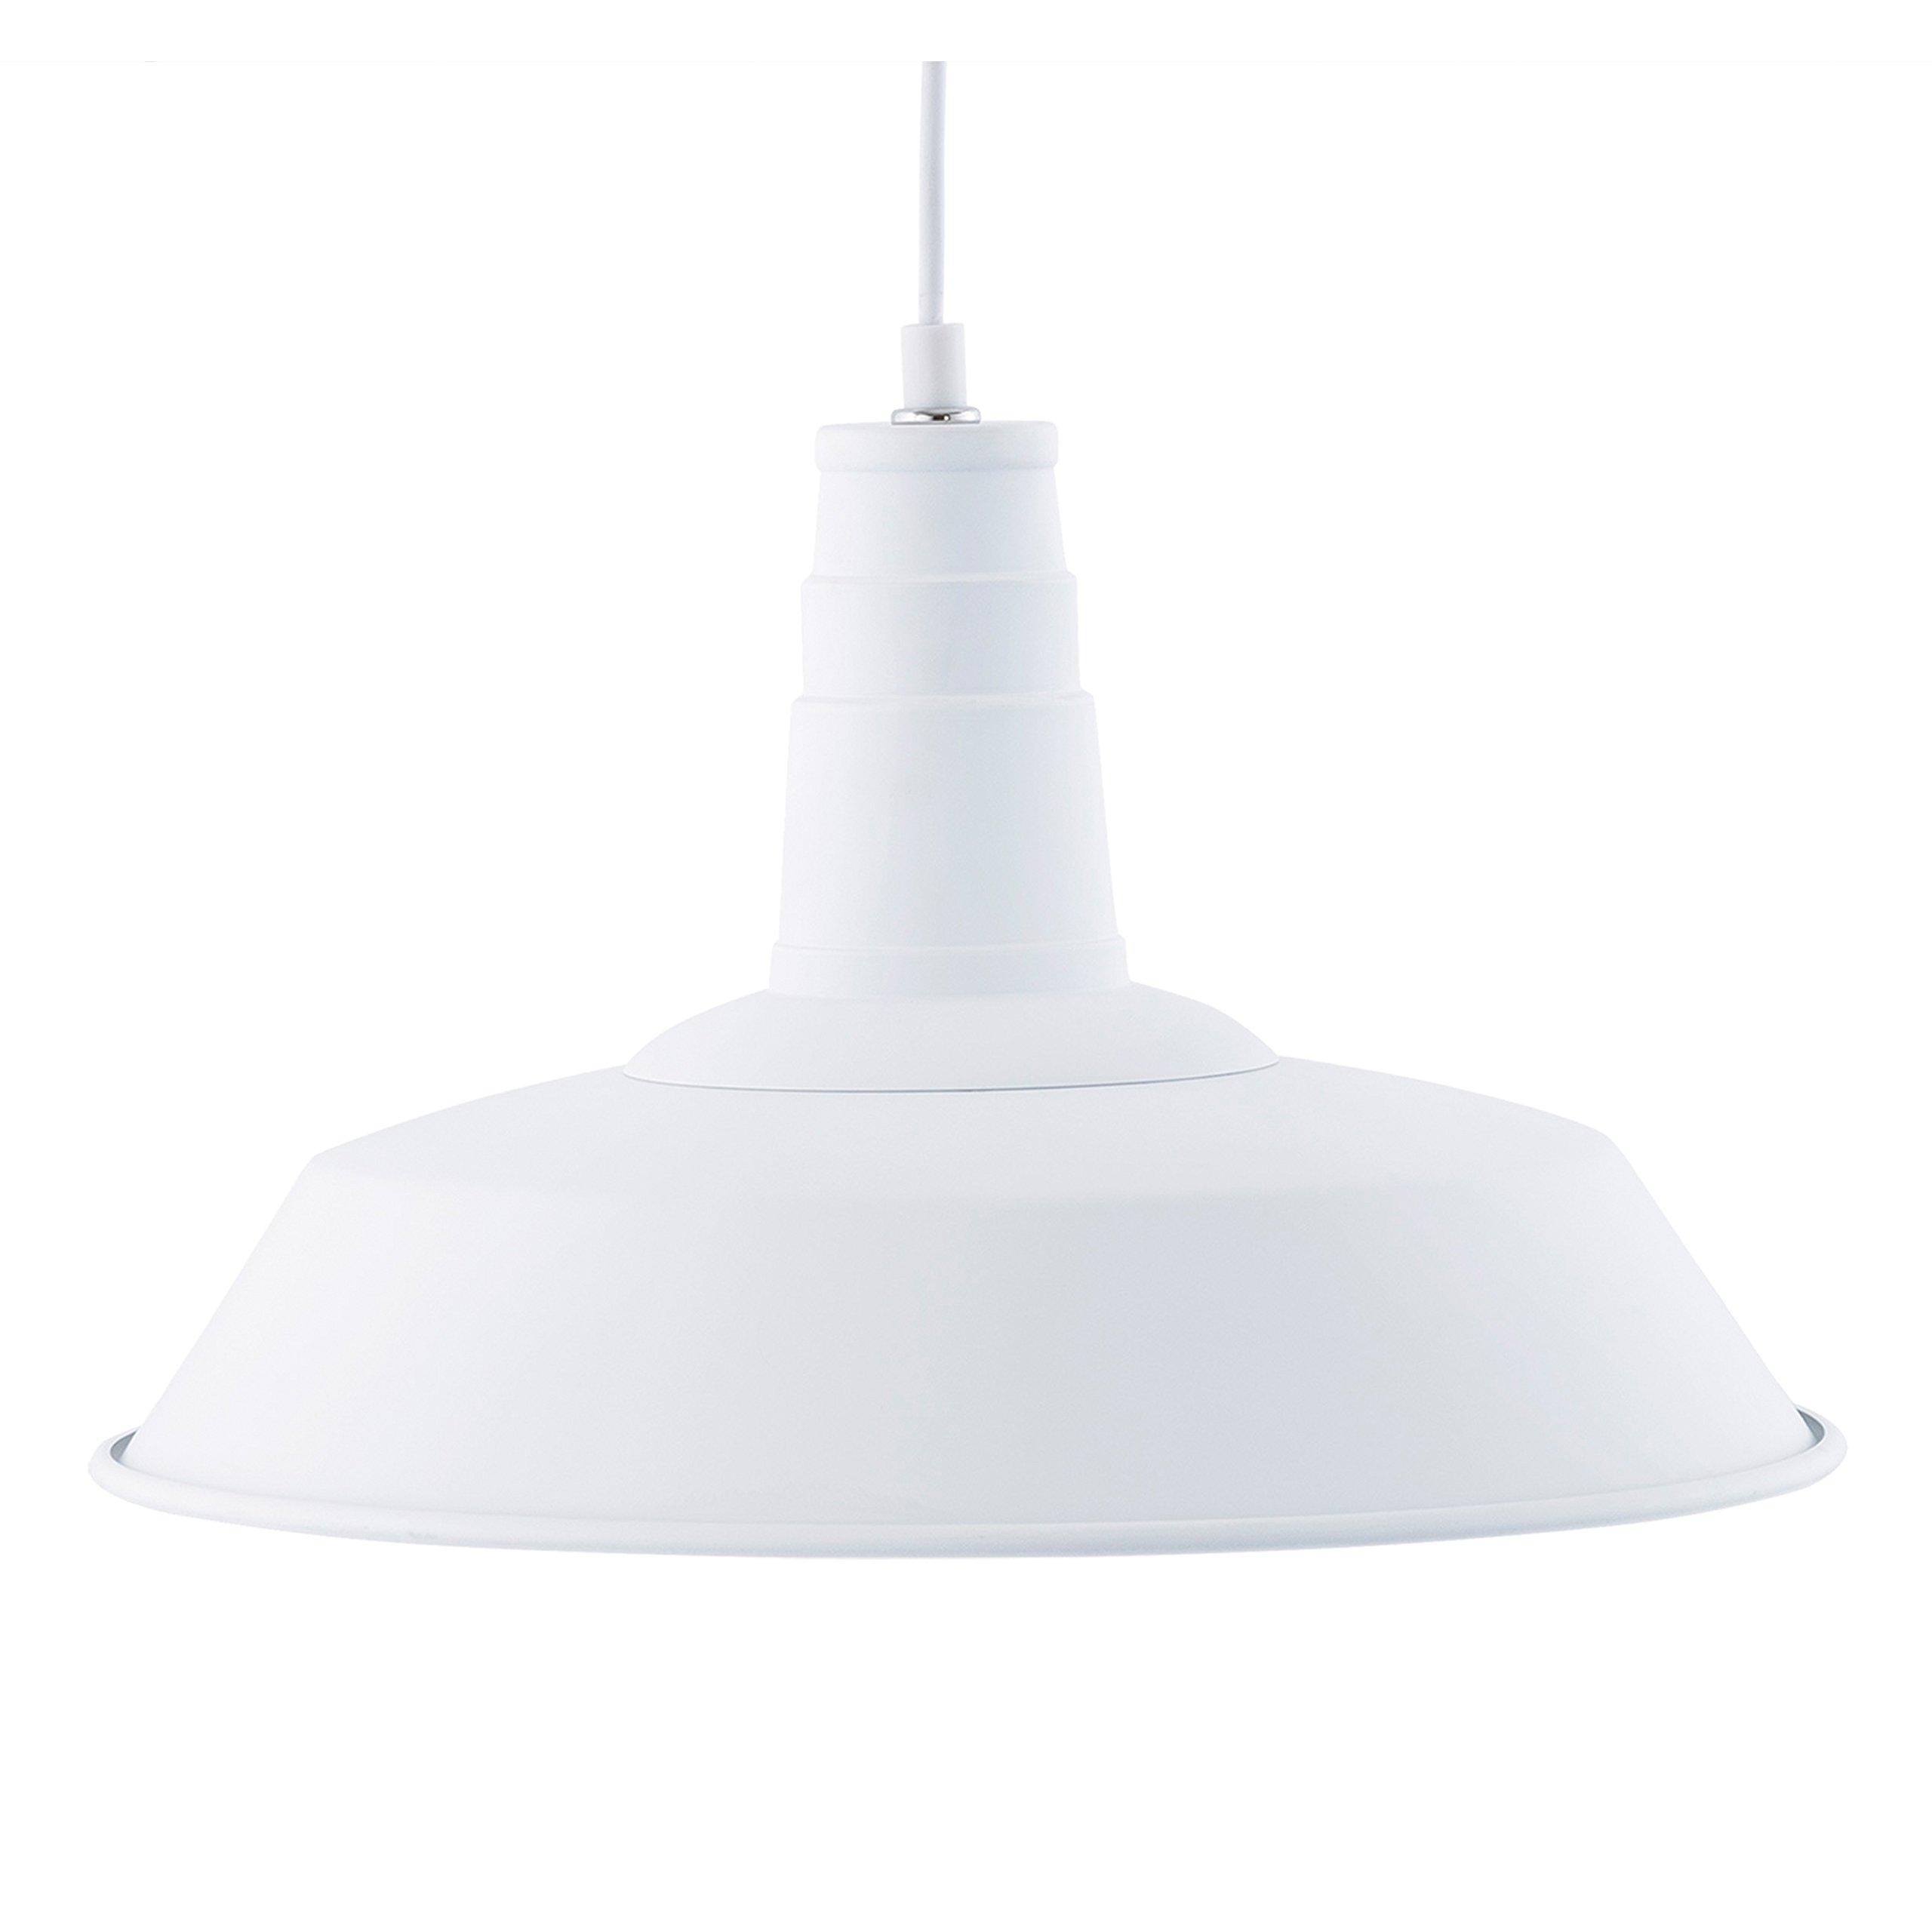 Light Society Kress Pendant Light, Matte White Shade with White Interior, Vintage Modern Industrial Farmhouse Lighting Fixture (LS-C199-WHI)